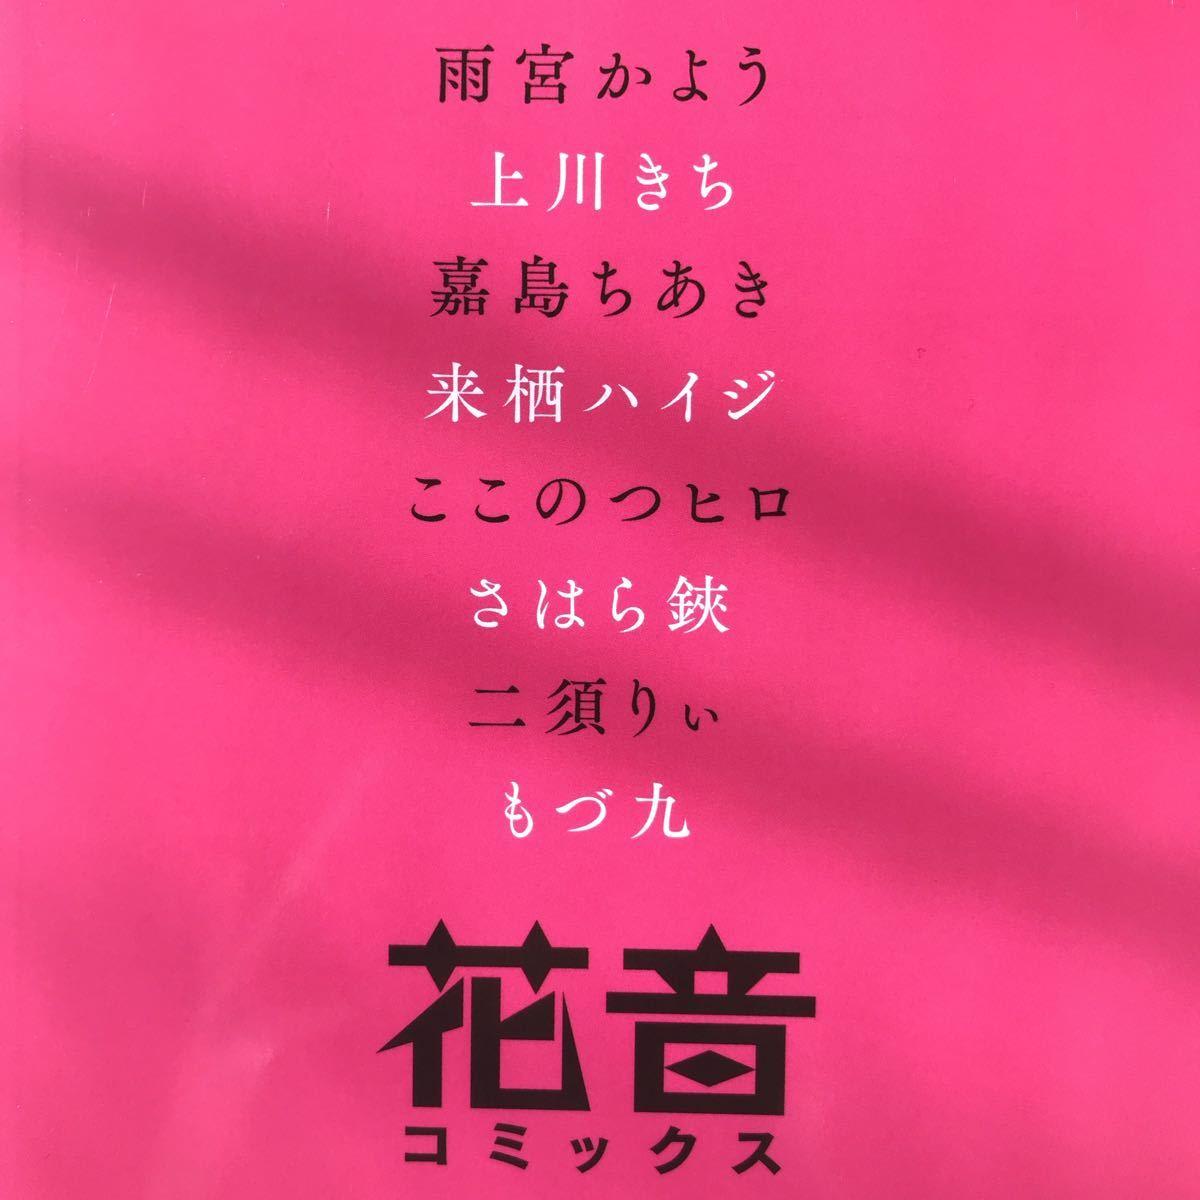 BL 花音コミックス 25周年発行記念 小冊子